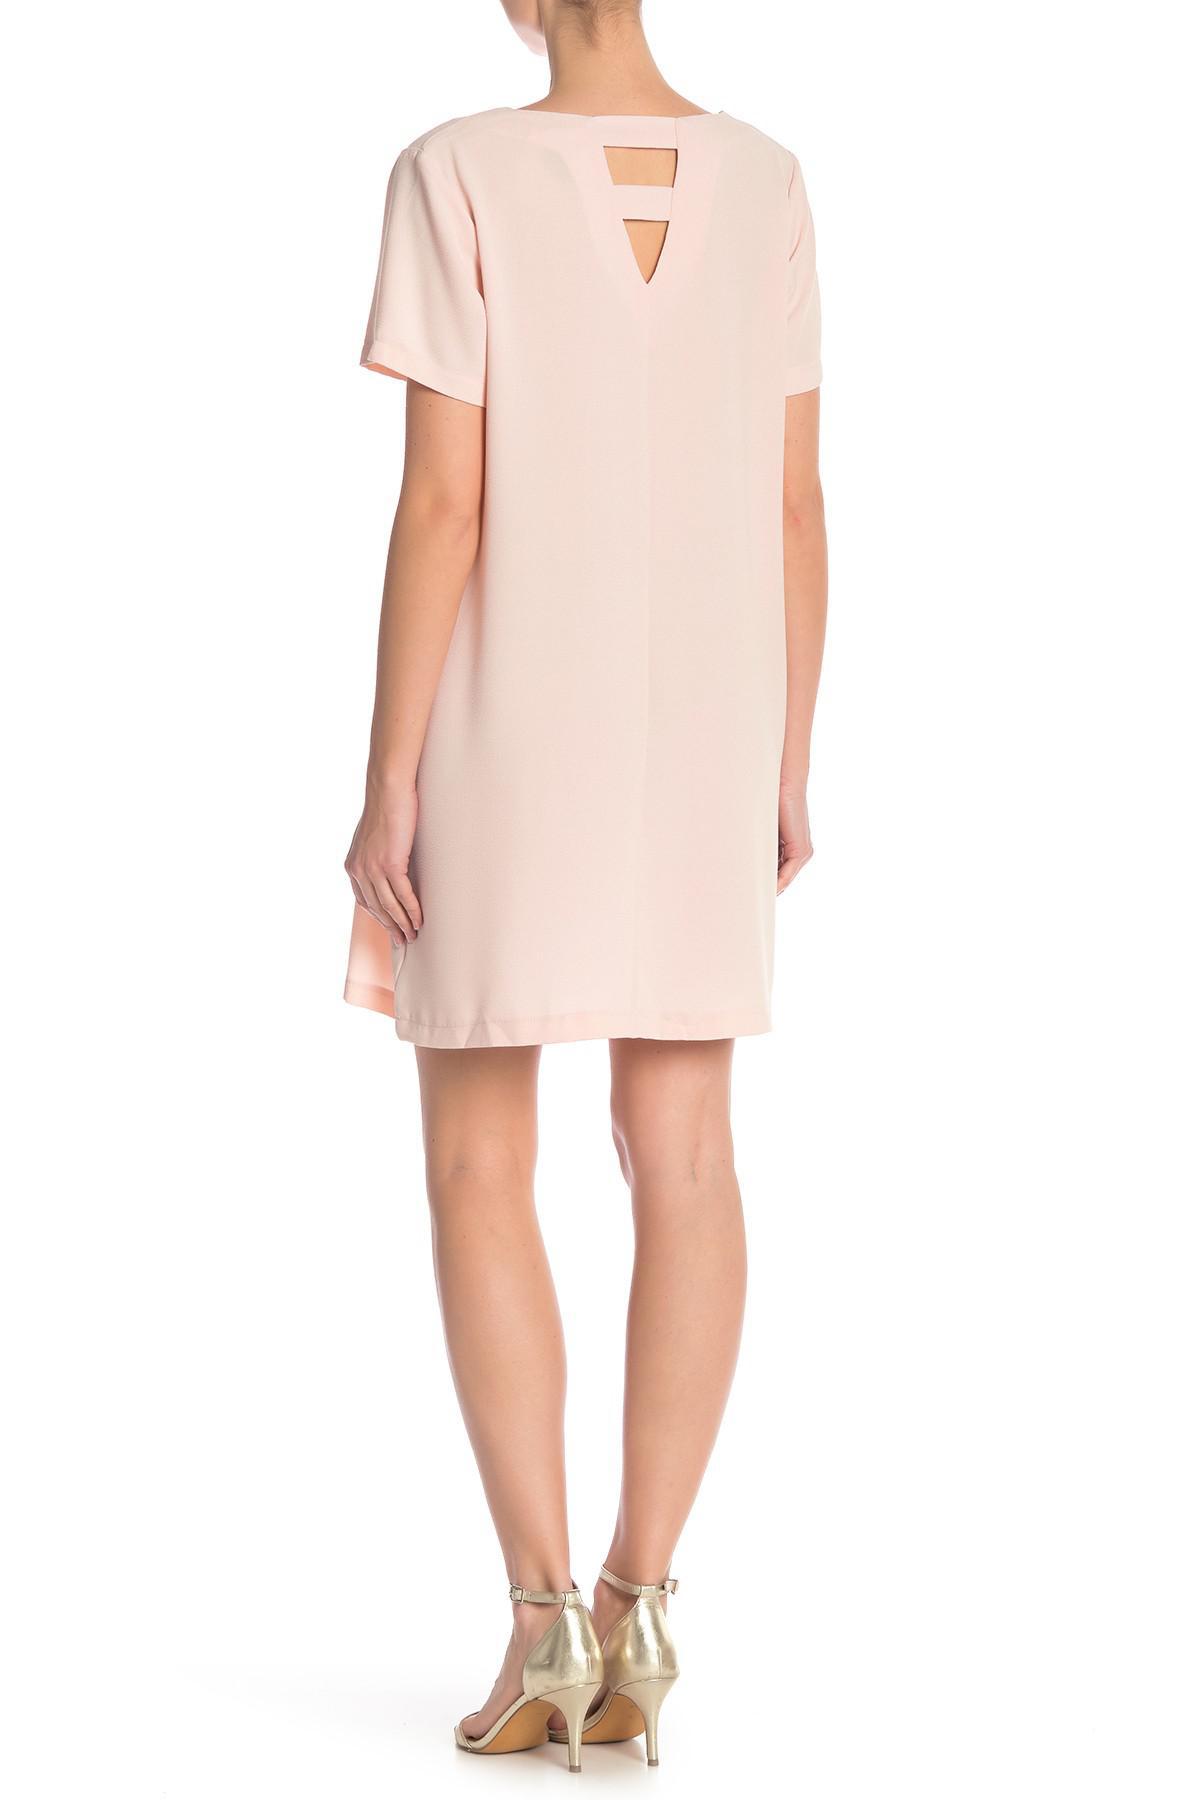 194c59ffae Bobeau Short Sleeve Crepe Shift Dress in Pink - Lyst